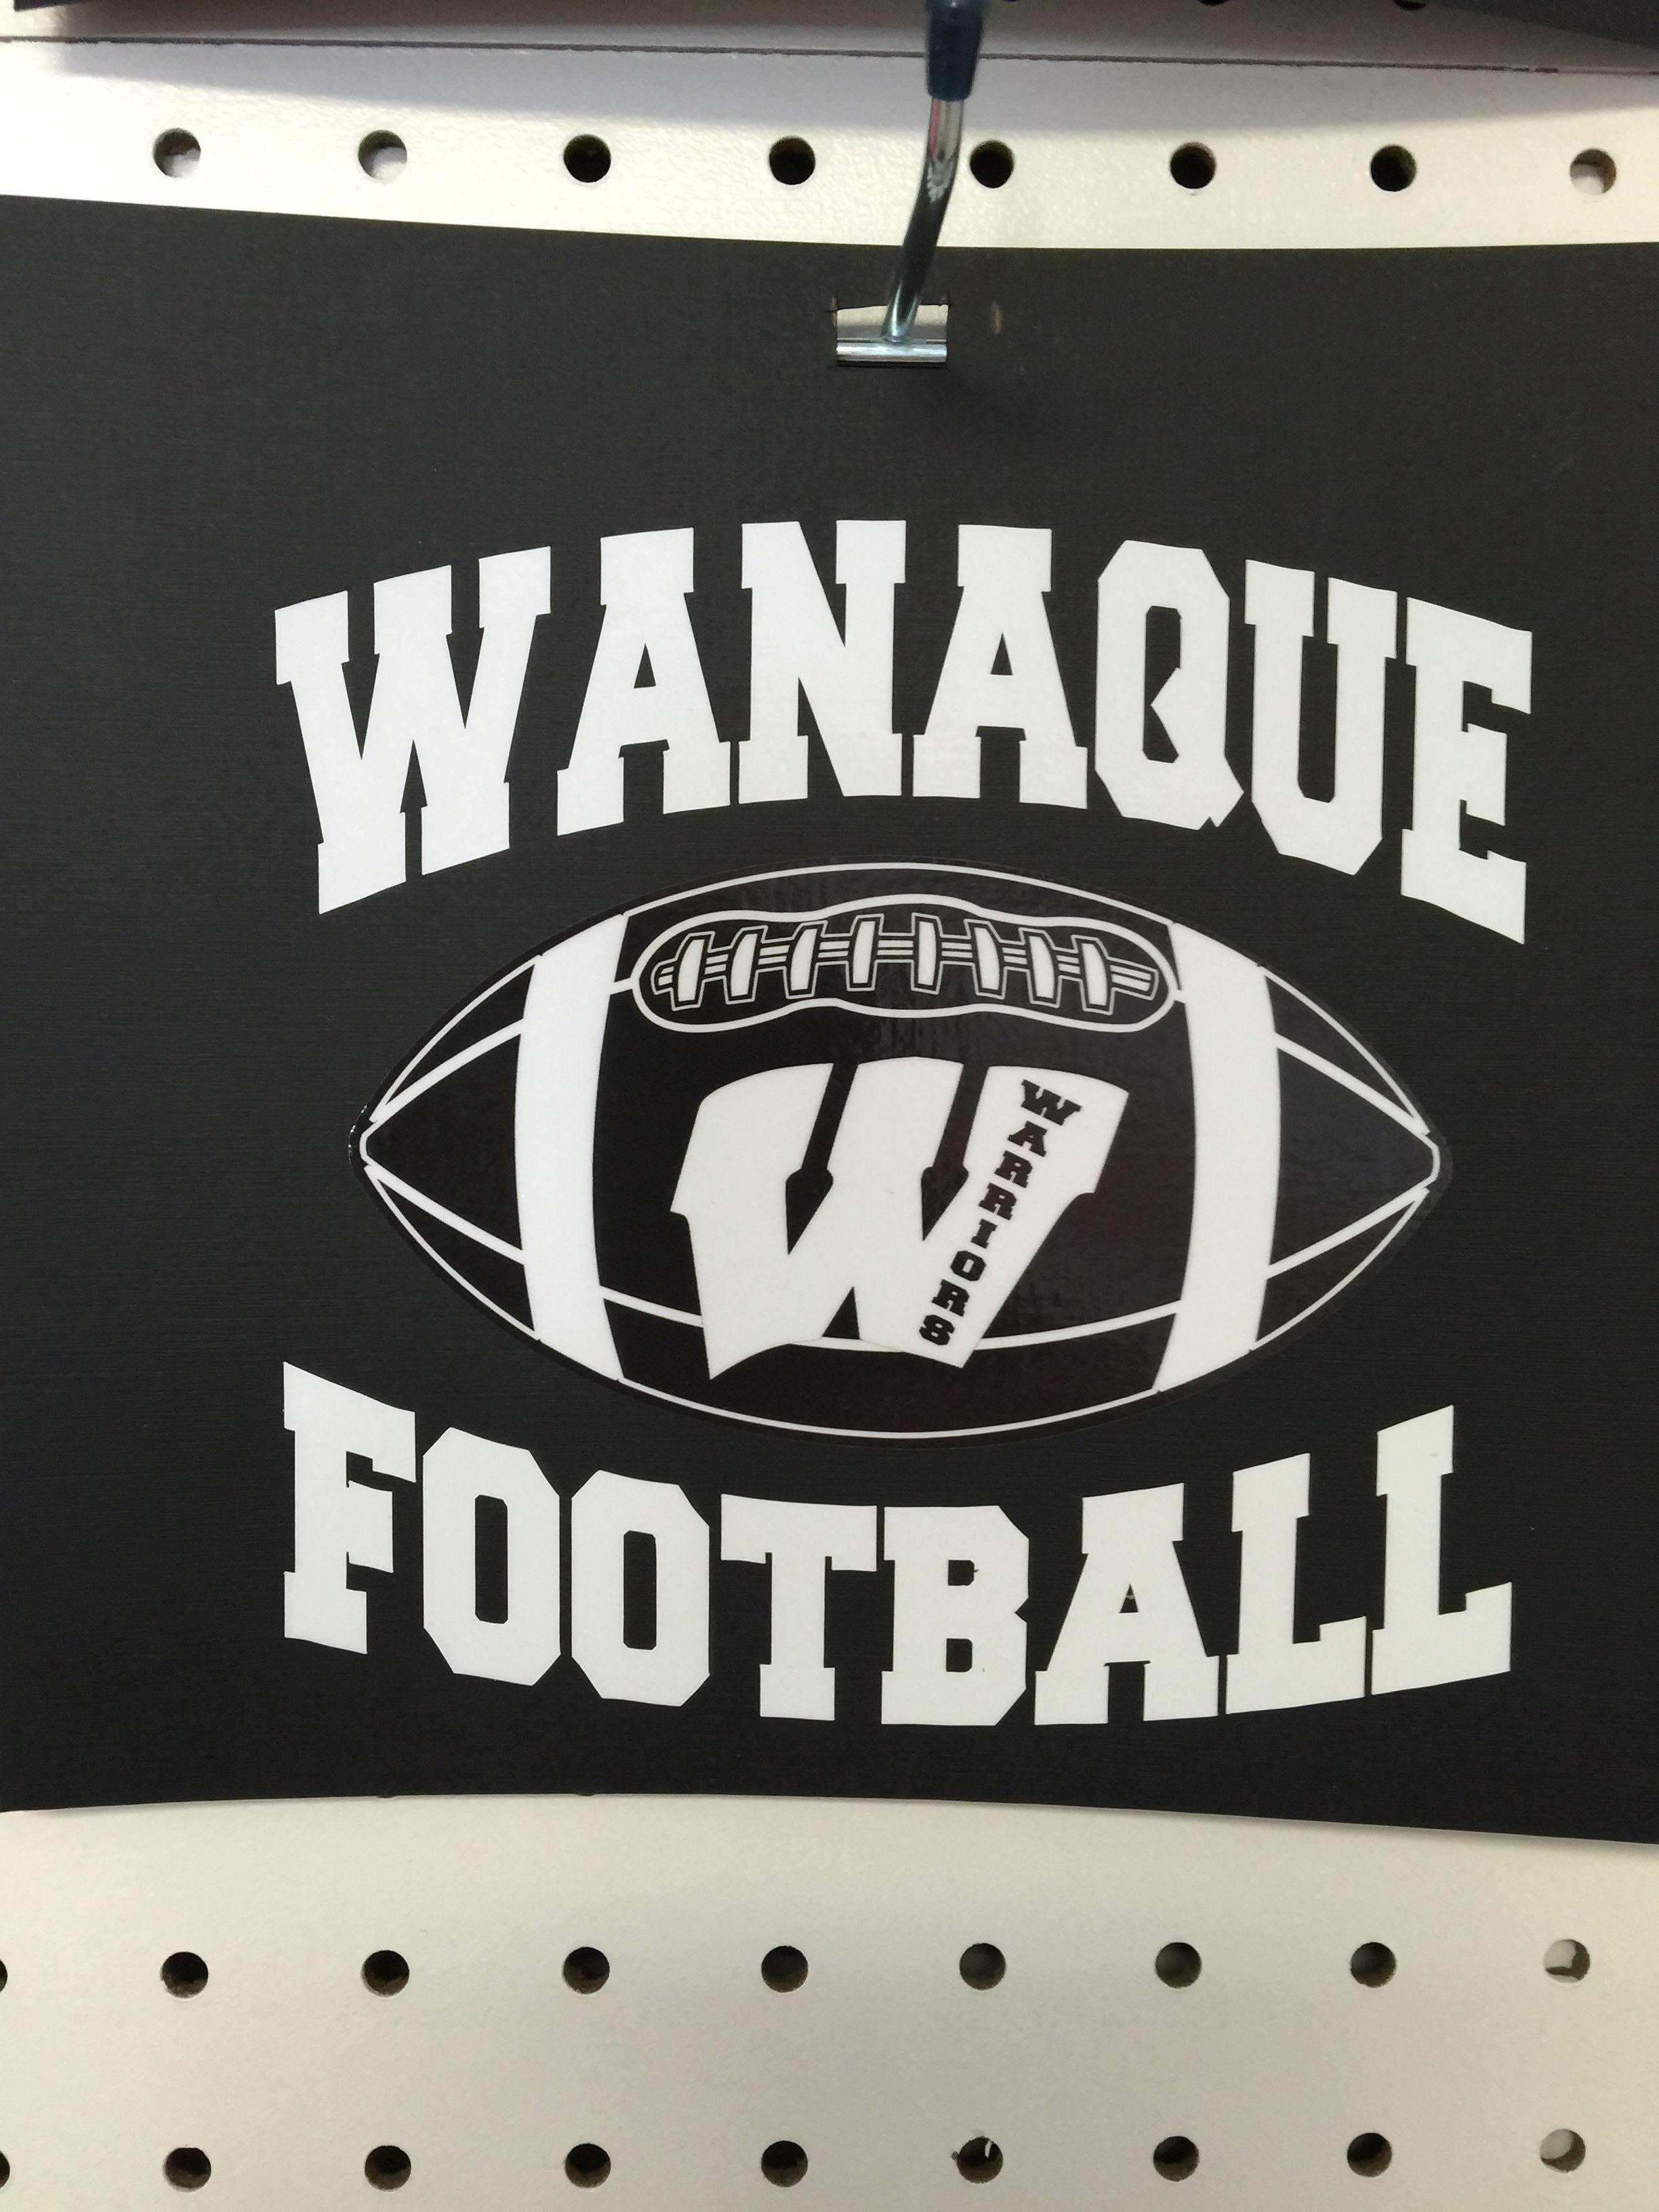 Wanaque Warriors Car Decal Car Decals Wanaque Ringwood